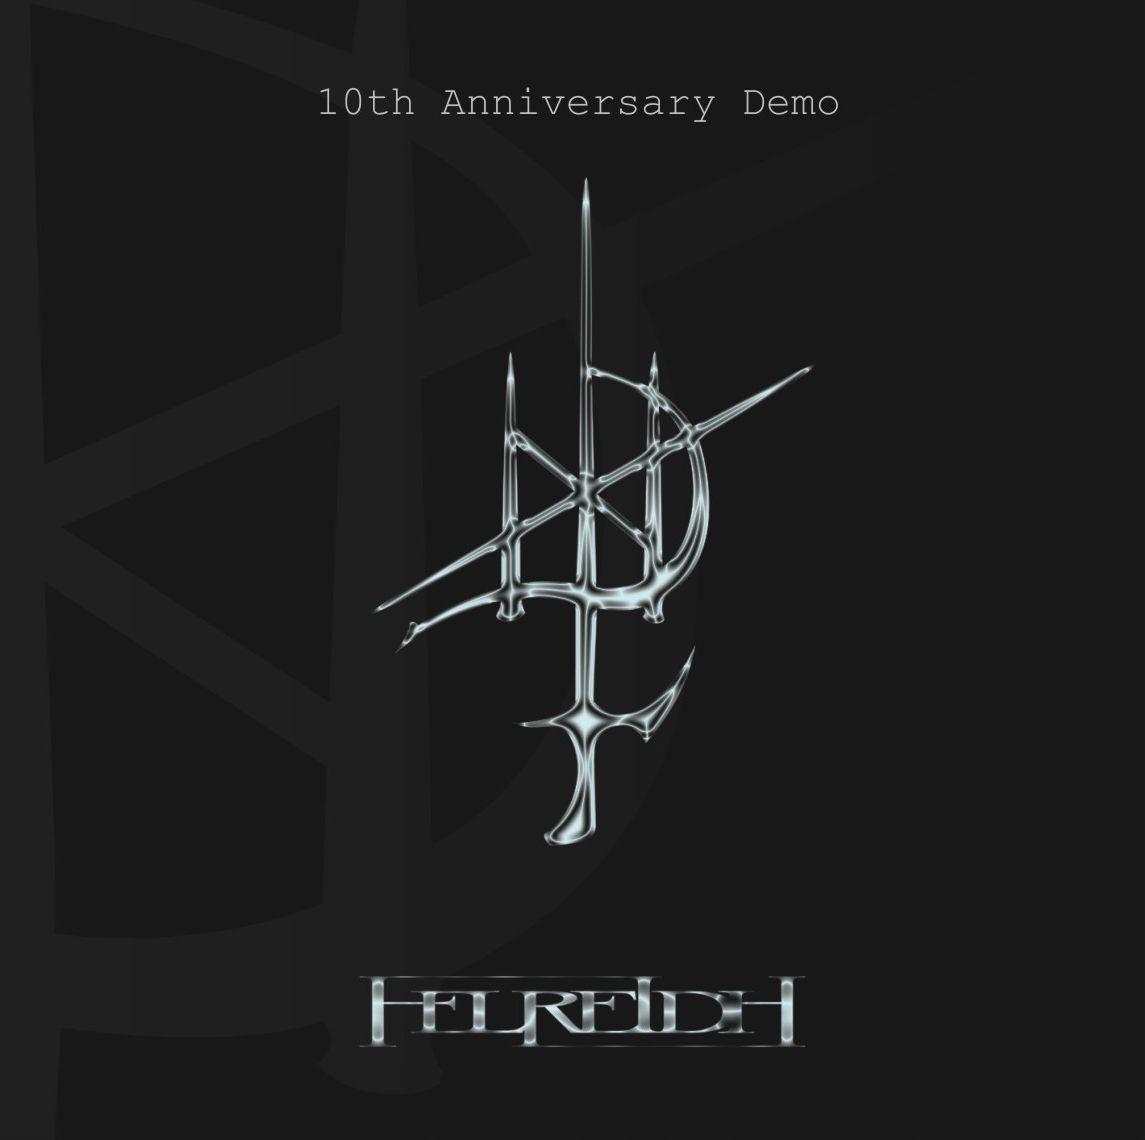 Helreið - 10th Anniversary Demo